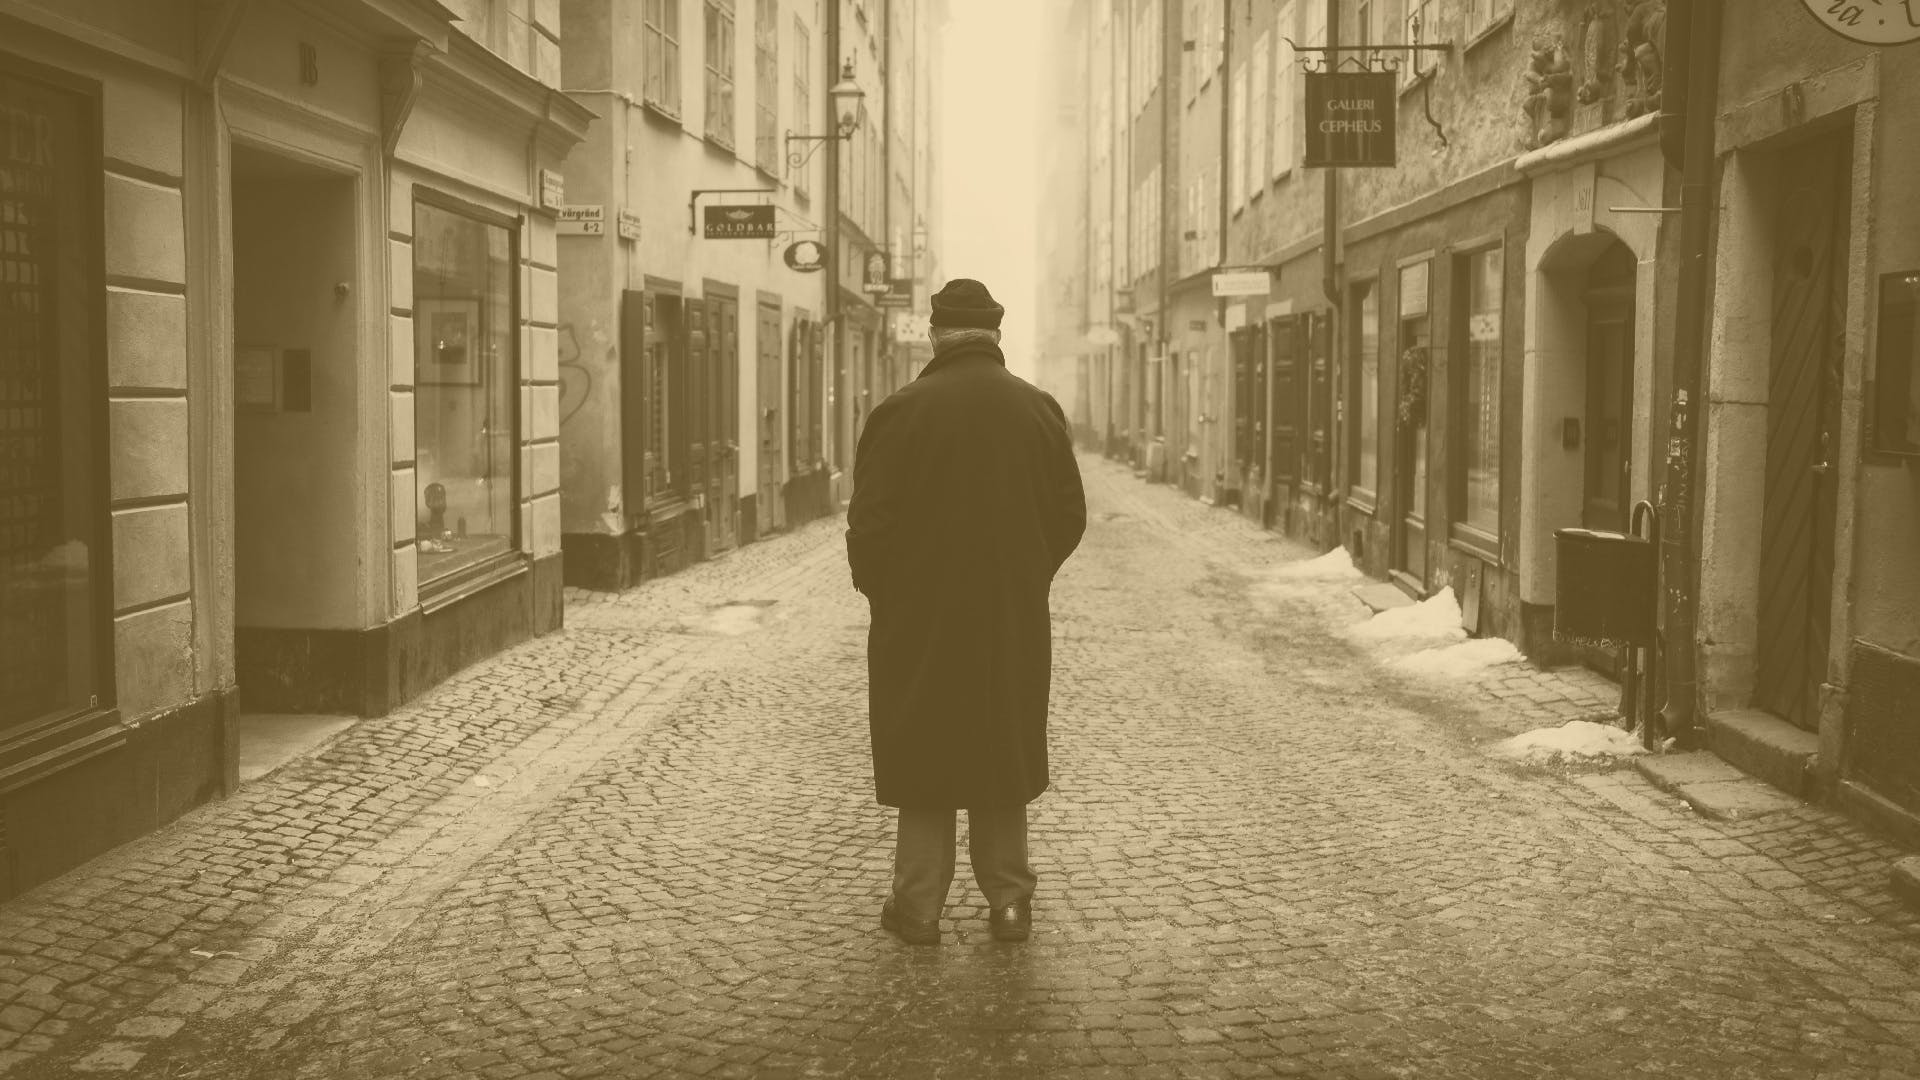 Rear View of a Man Walking on Cobblestone